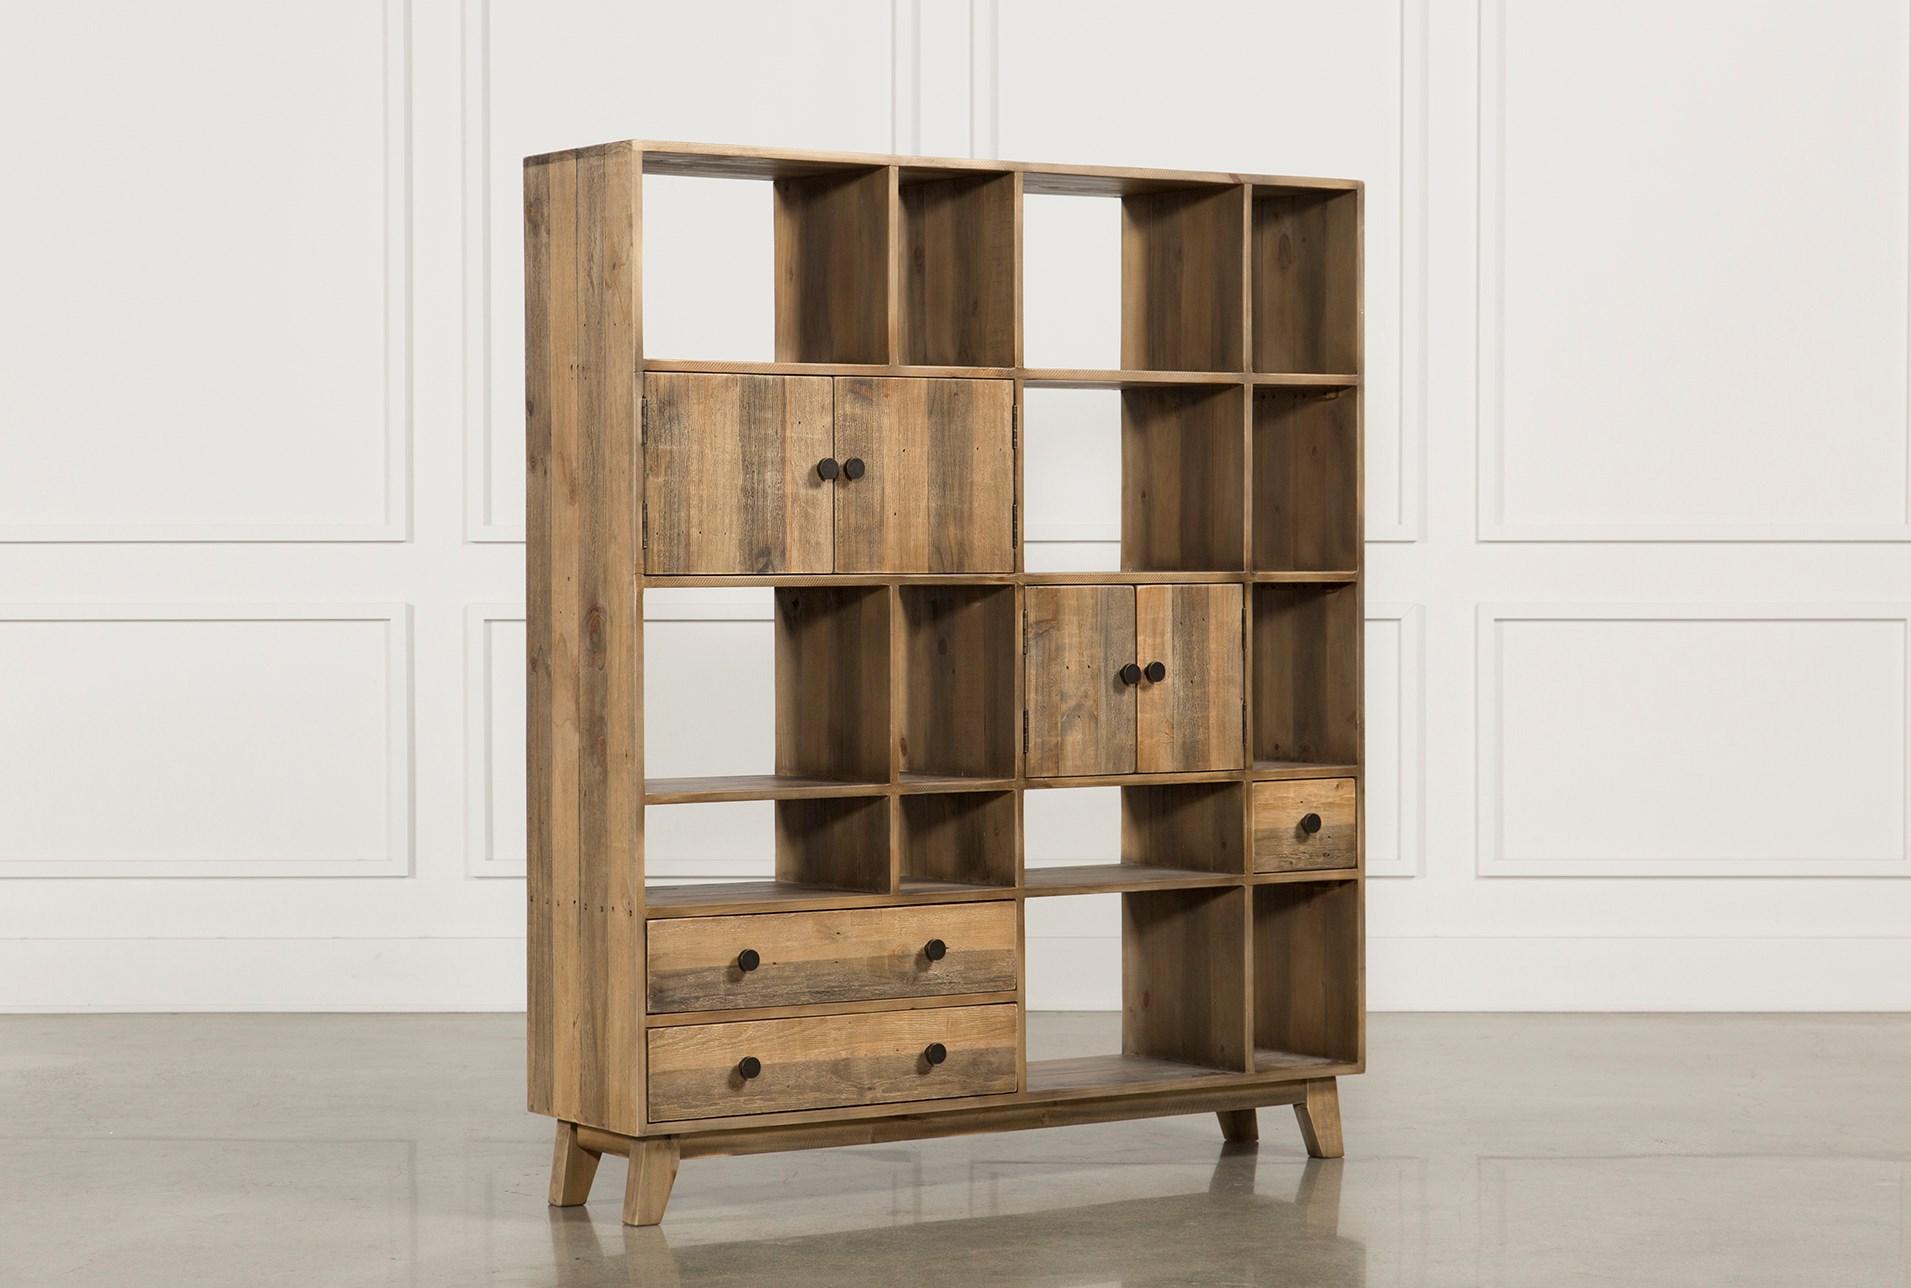 bookcases products collection woodlands wynwood number flexsteel bookcase item door sliding